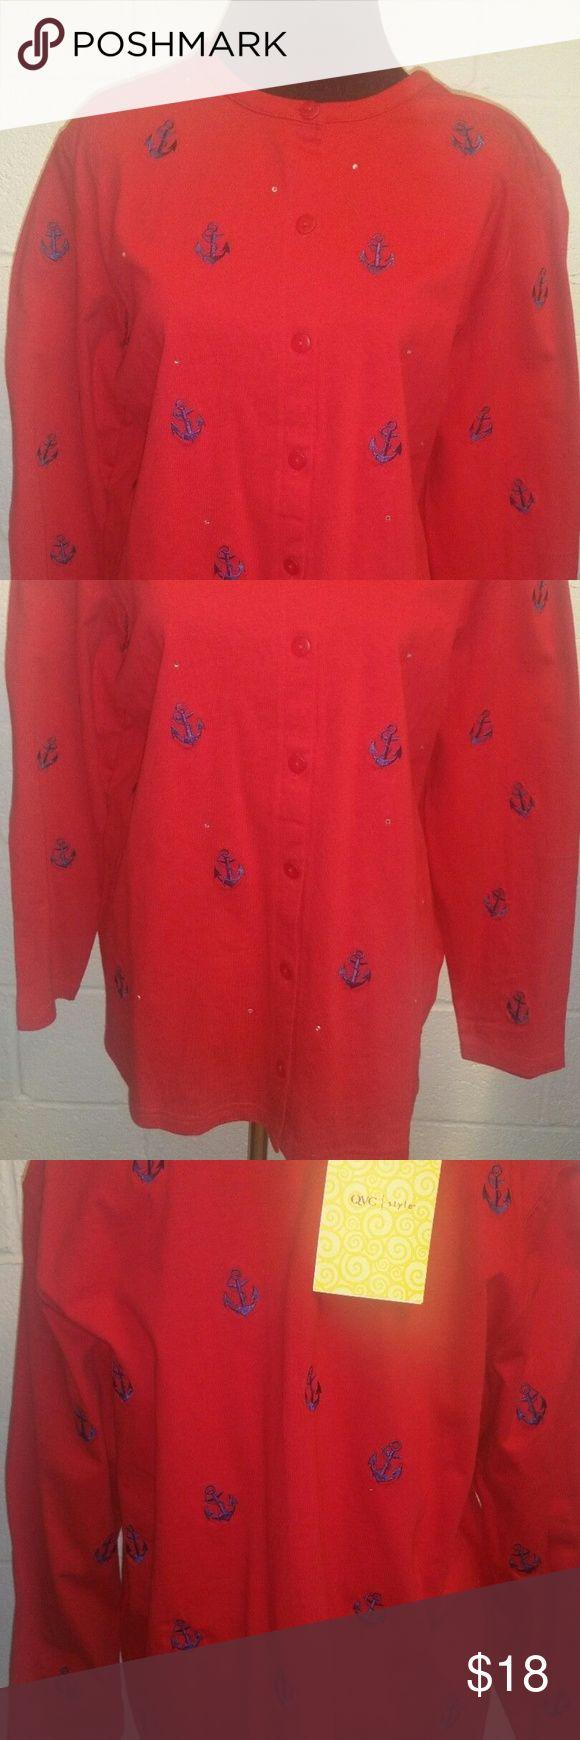 NWT Quacker Factory QVC Cardigan NWT  Quacker Factory  QVC  Knit Top  Nautical Cardigan  Red w/ Blue Anchors   Rhinestones 100% Cotton Size 1X Quaker Factory Sweaters Cardigans